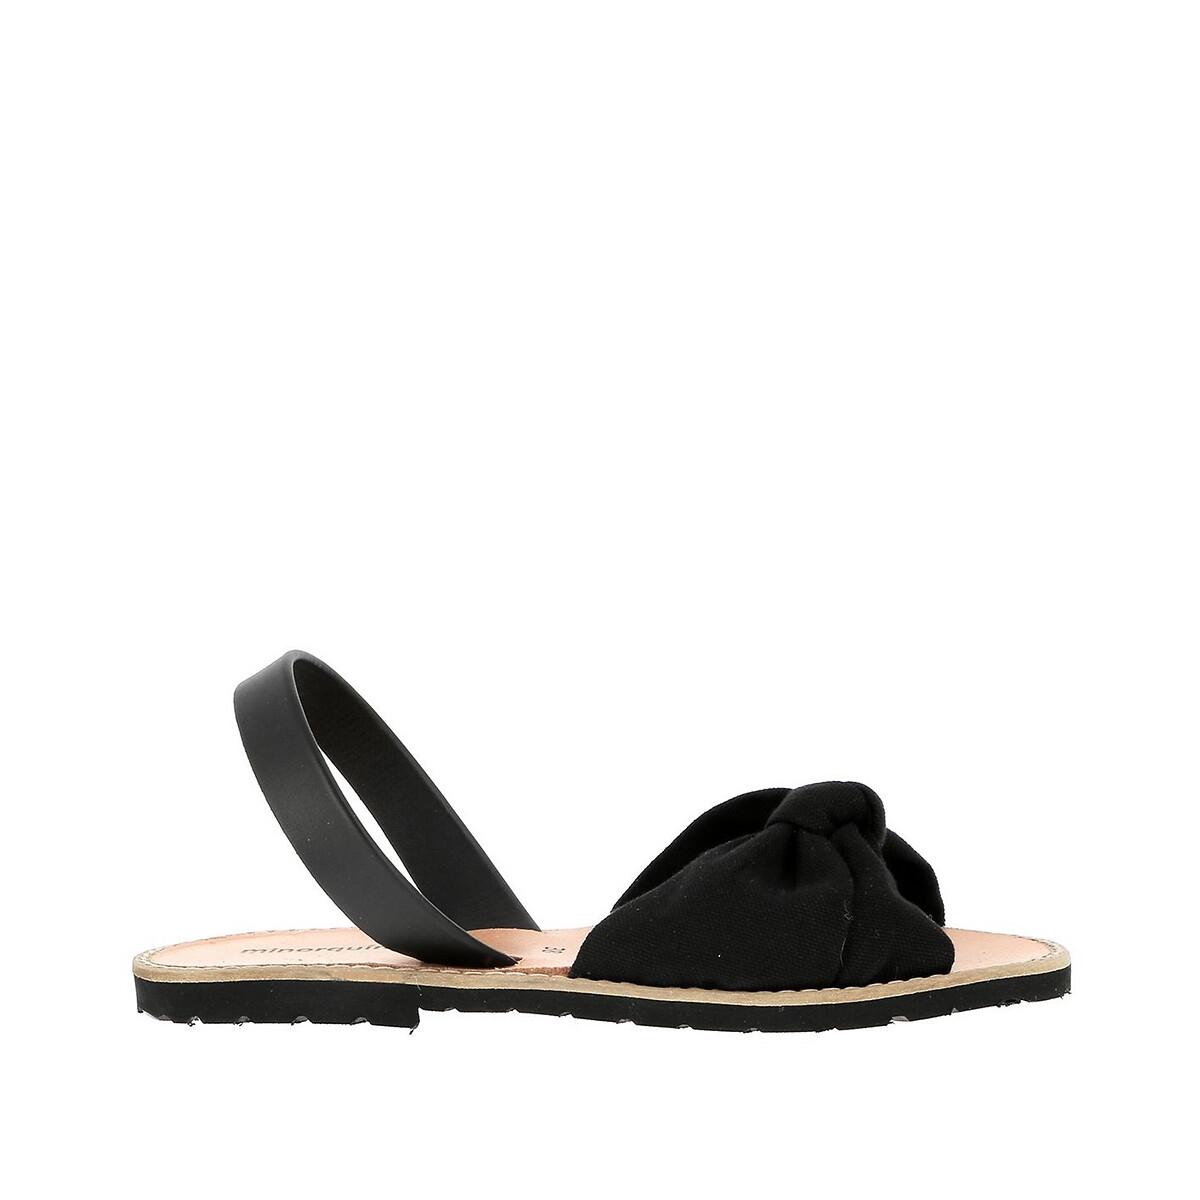 Фото - Сандалии LaRedoute С бантиком из кожи на плоском каблуке AVARCA BAHIA 36 черный сандалии la redoute из кожи с перекрещенными ремешками на плоском каблуке 39 розовый